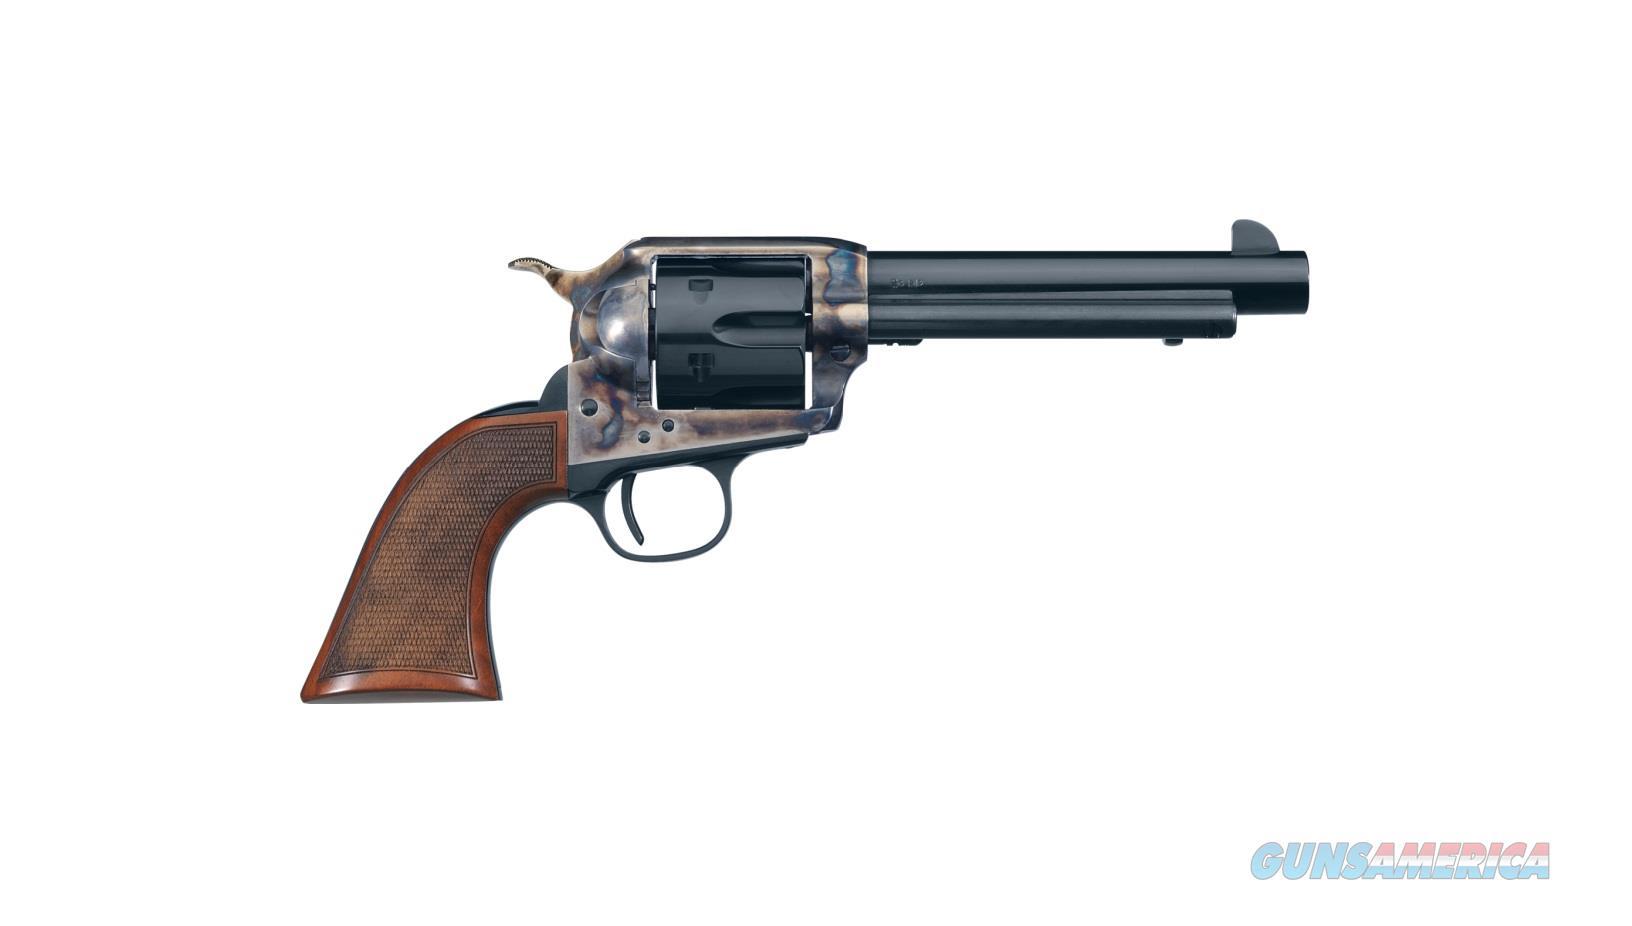 "Uberti Short Stroke SASS Pro 5.5"" .357 Magnum SKU: 356831  Guns > Pistols > Uberti Pistols > Ctg."